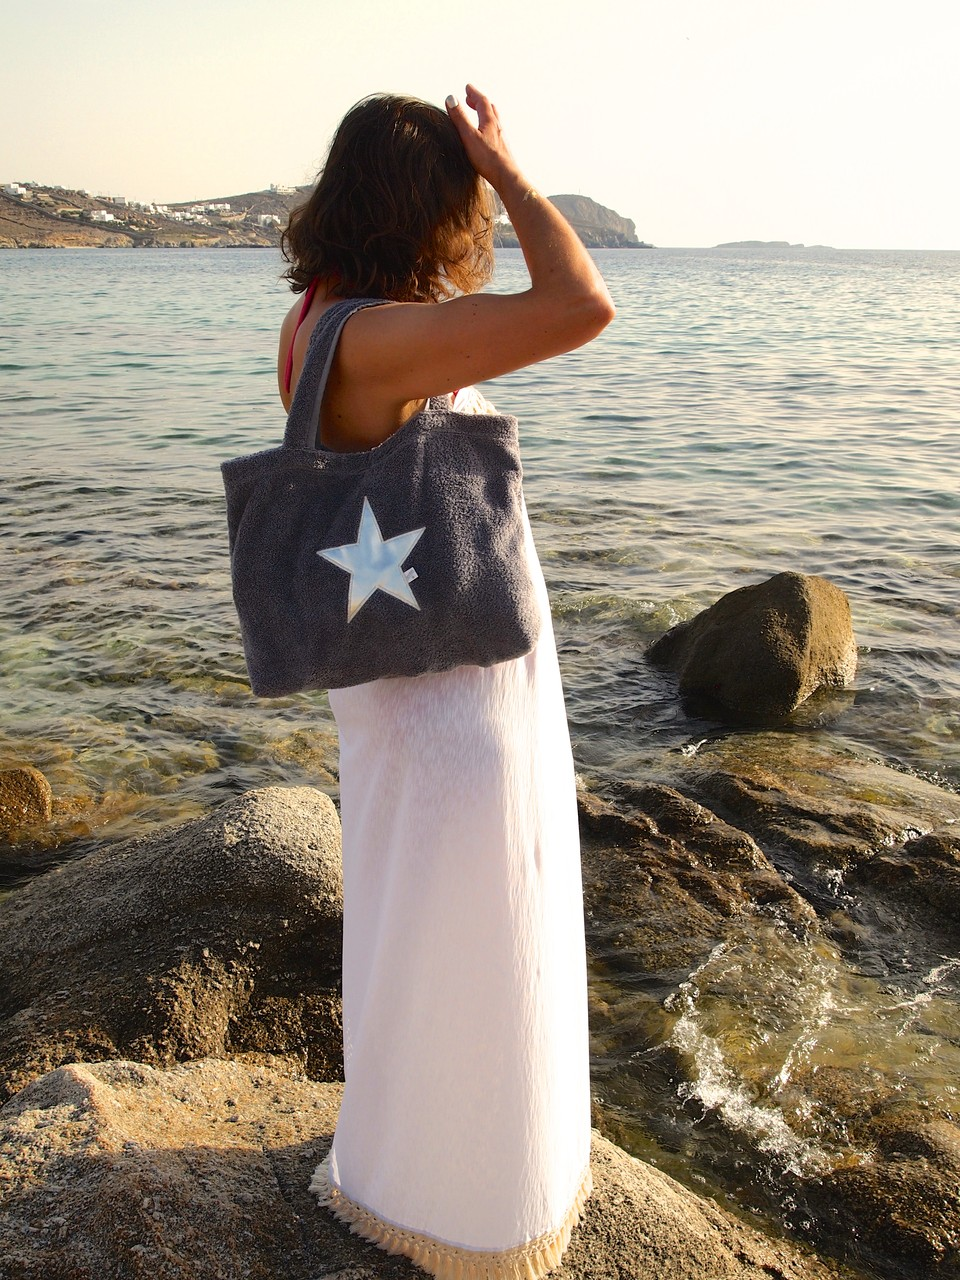 BYRH Beach Bag - Pool Bag - Platin - Siver edition - Mykonos - Hotel San Giorgio